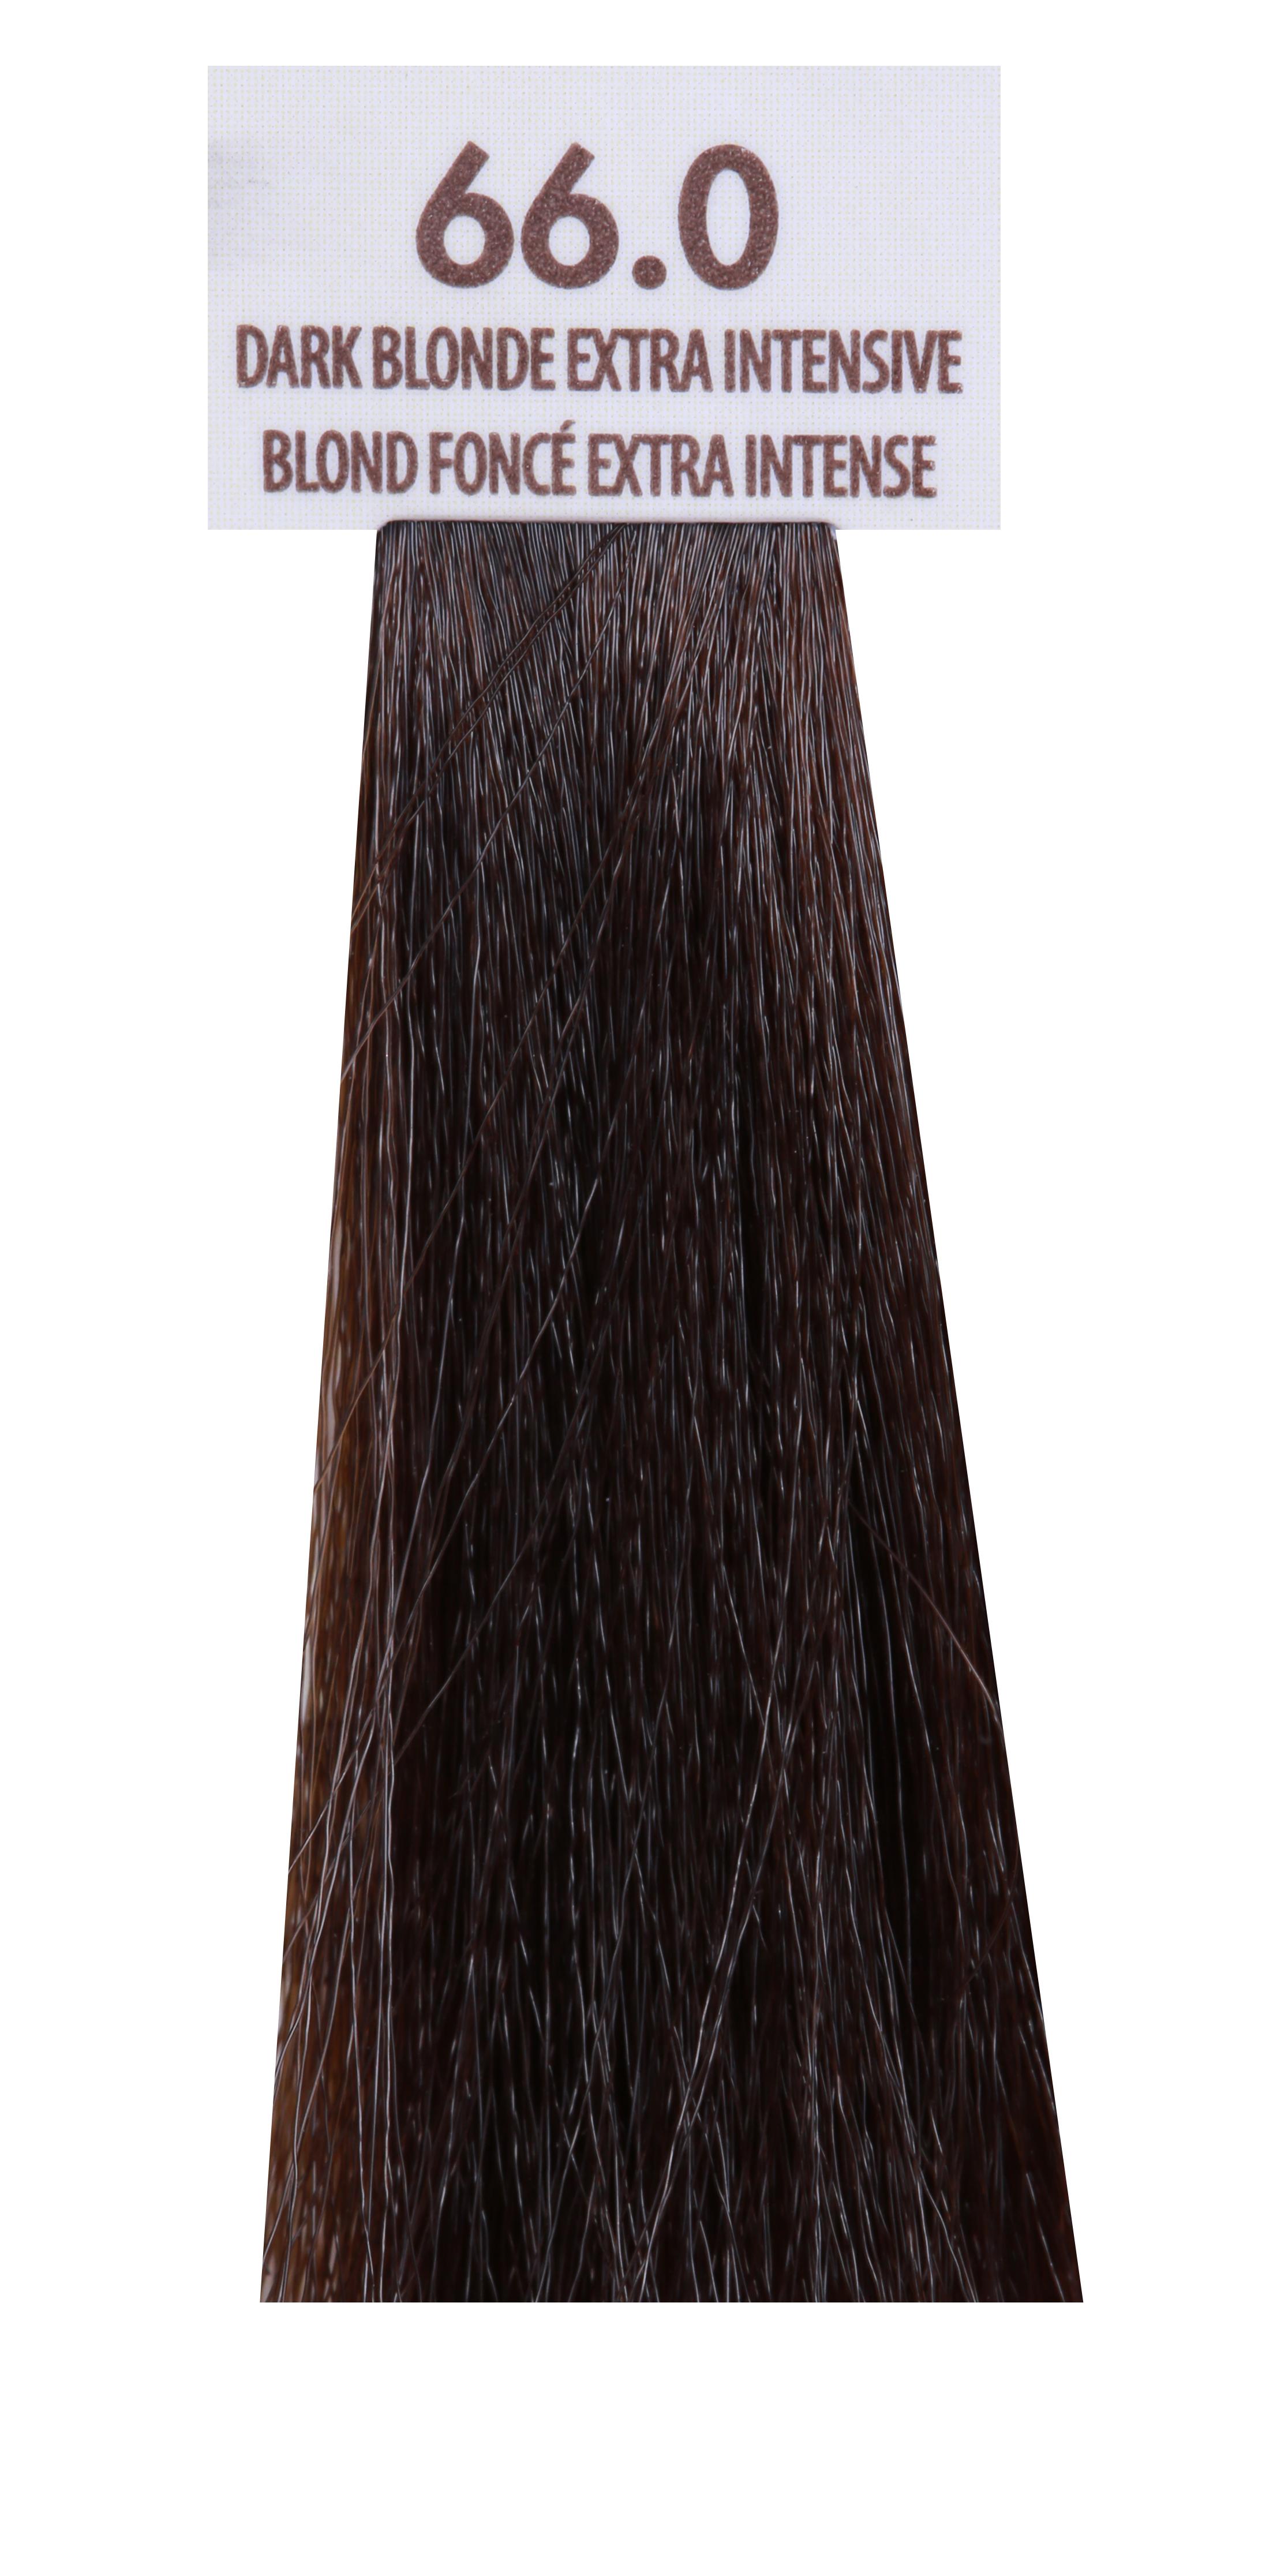 MACADAMIA NATURAL OIL 66.0 краска для волос, темный экстра яркий блондин / MACADAMIA COLORS 100 мл фото